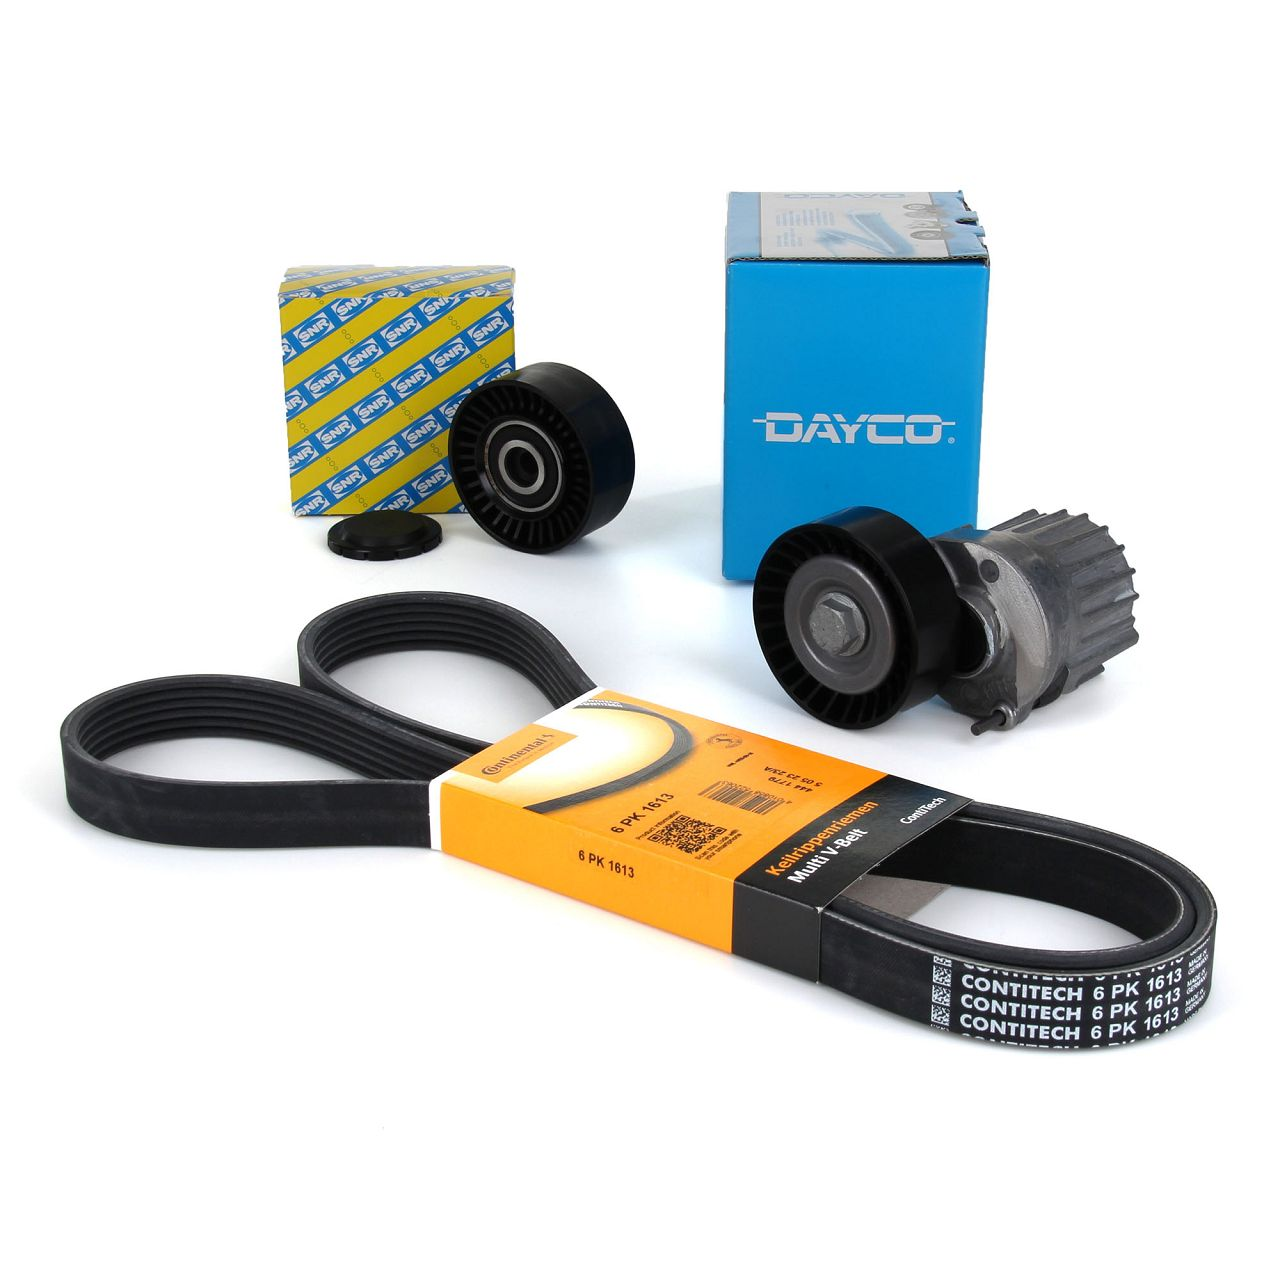 DAYCO 6PK1613 Keilrippenriemen + Spanner + Rolle AUDI A4 A6 VW Crafter 1.9/2.0TDI